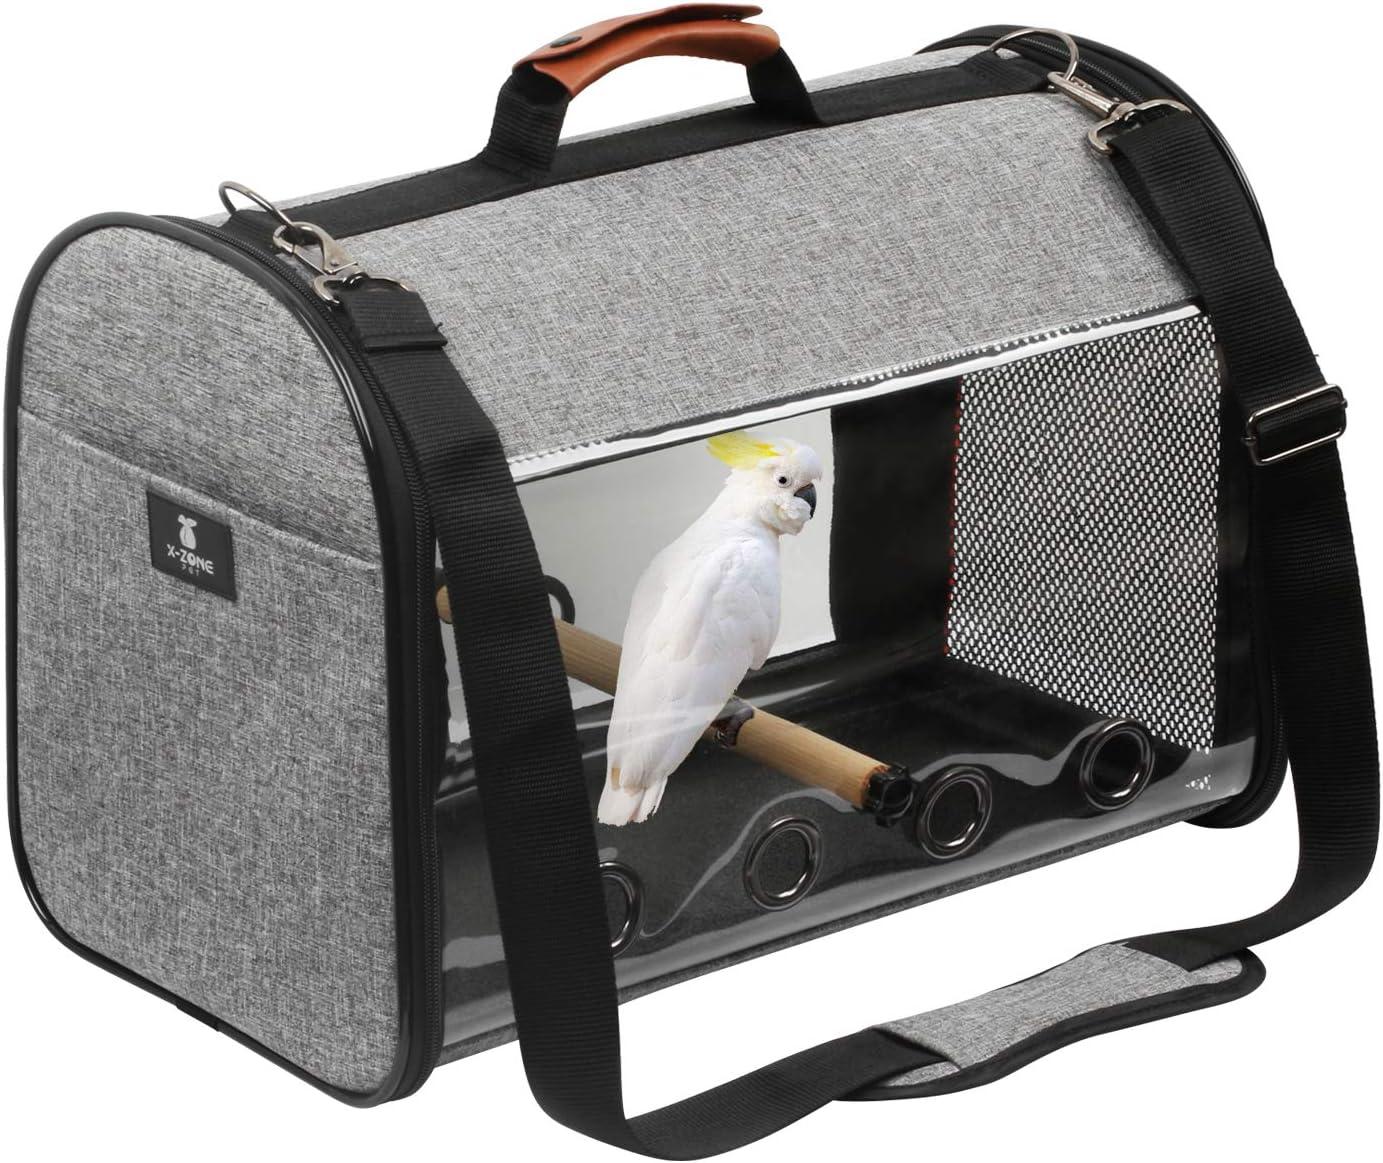 X Zone Pet Bird Travel Bag Portable Pet Bird Parrot Carrier Transparent Breathable Travel Cage Lightweight Bird Carrier Bird Travel Cage Amazon Co Uk Pet Supplies